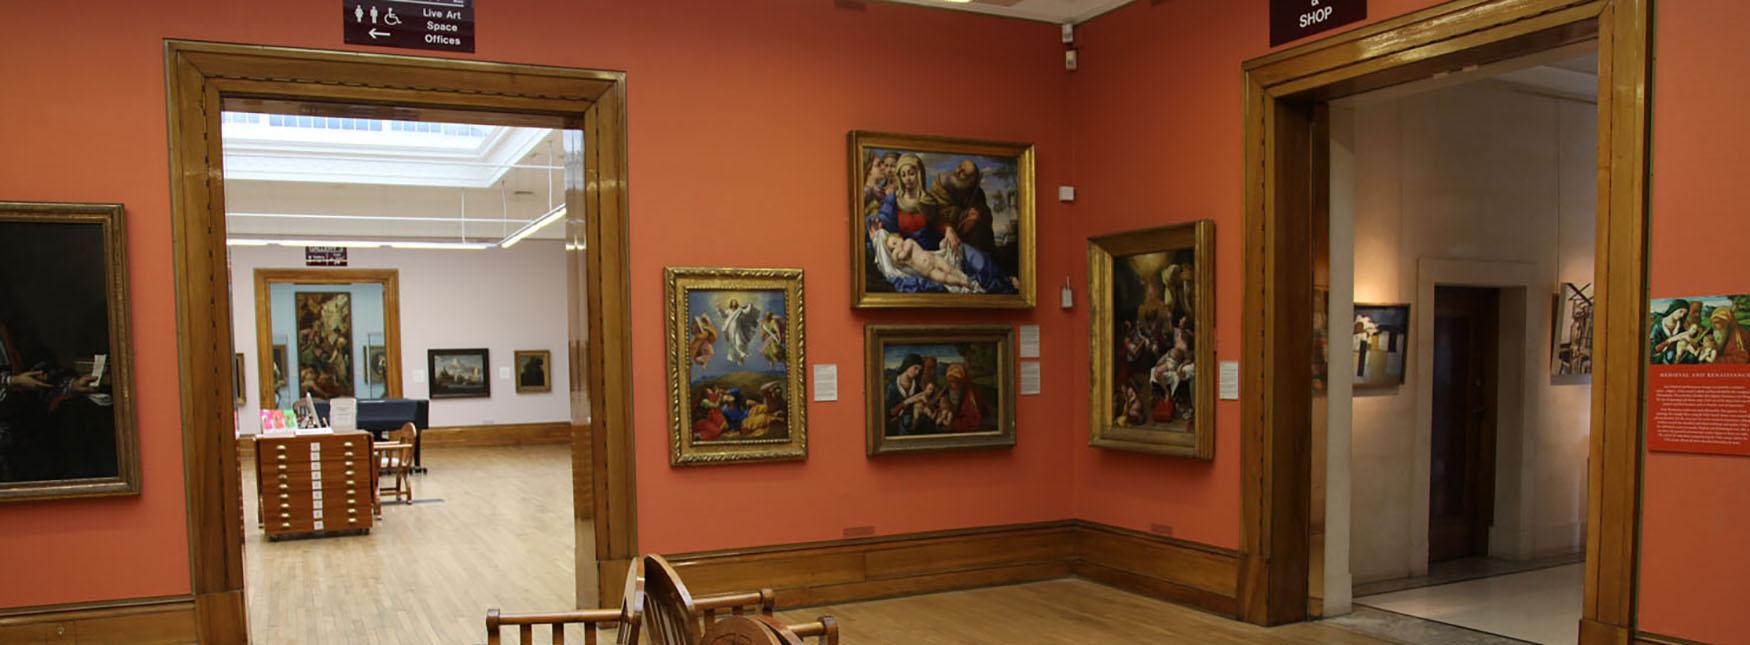 Ferens Art gallery interior